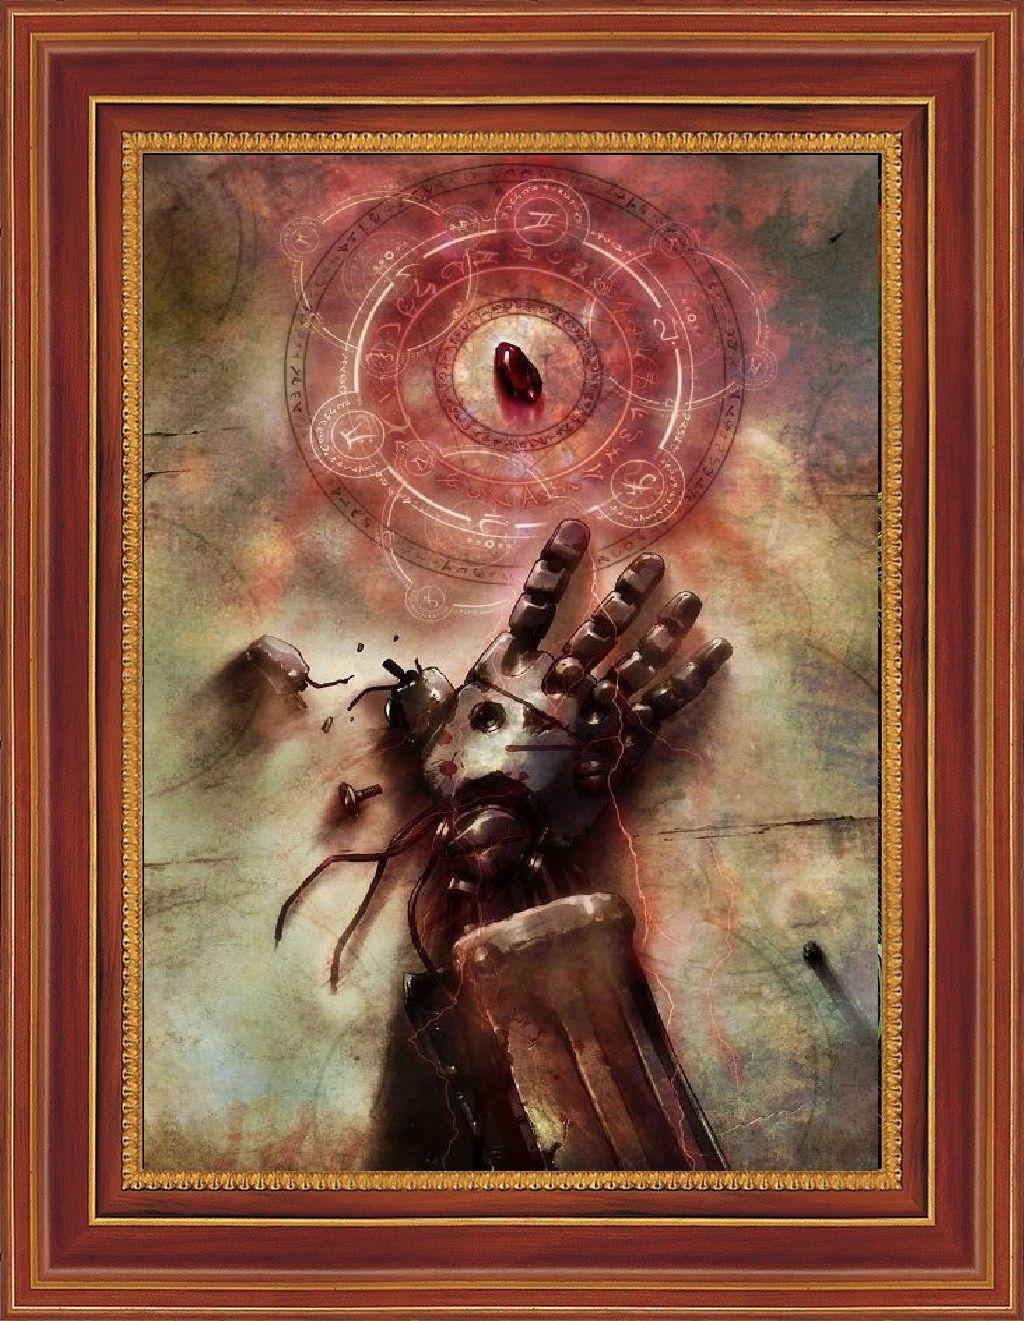 2017 single unframed fullmetal alchemist anime steel hand painting